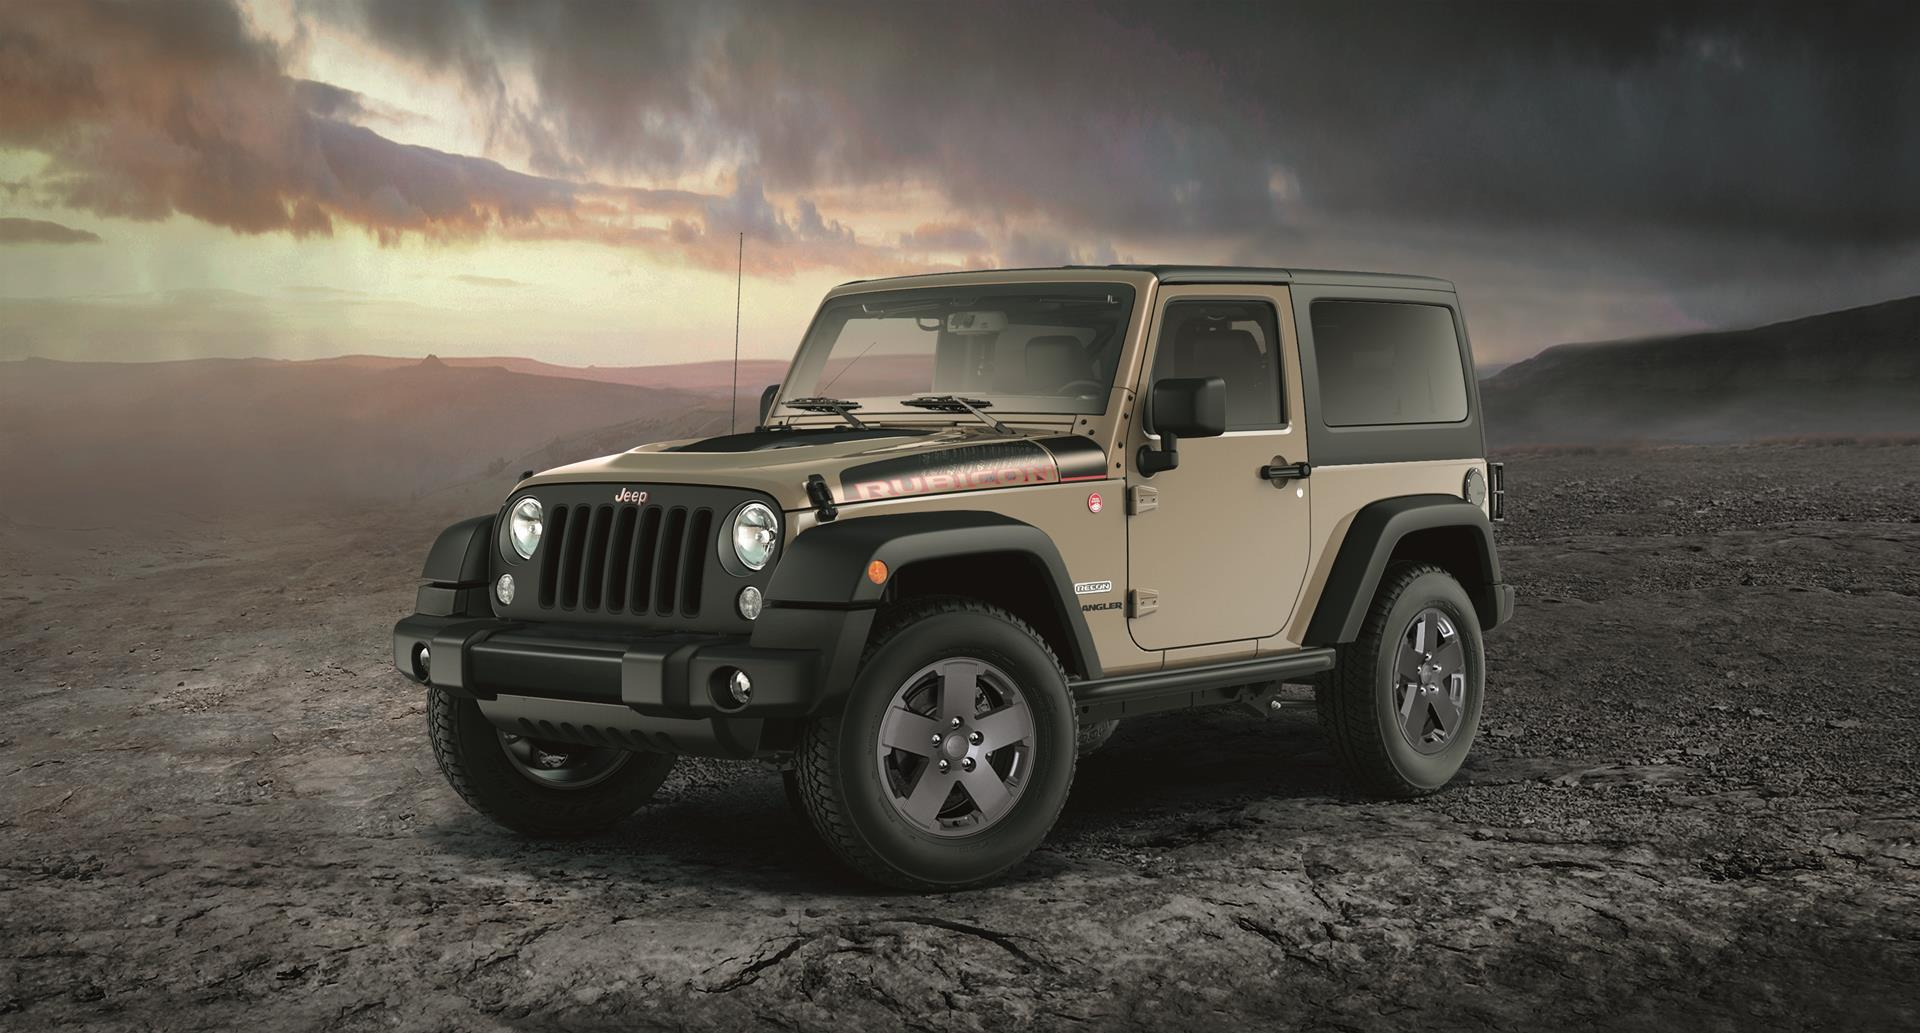 2017 Jeep Wrangler Rubicon Recon News And Information Com